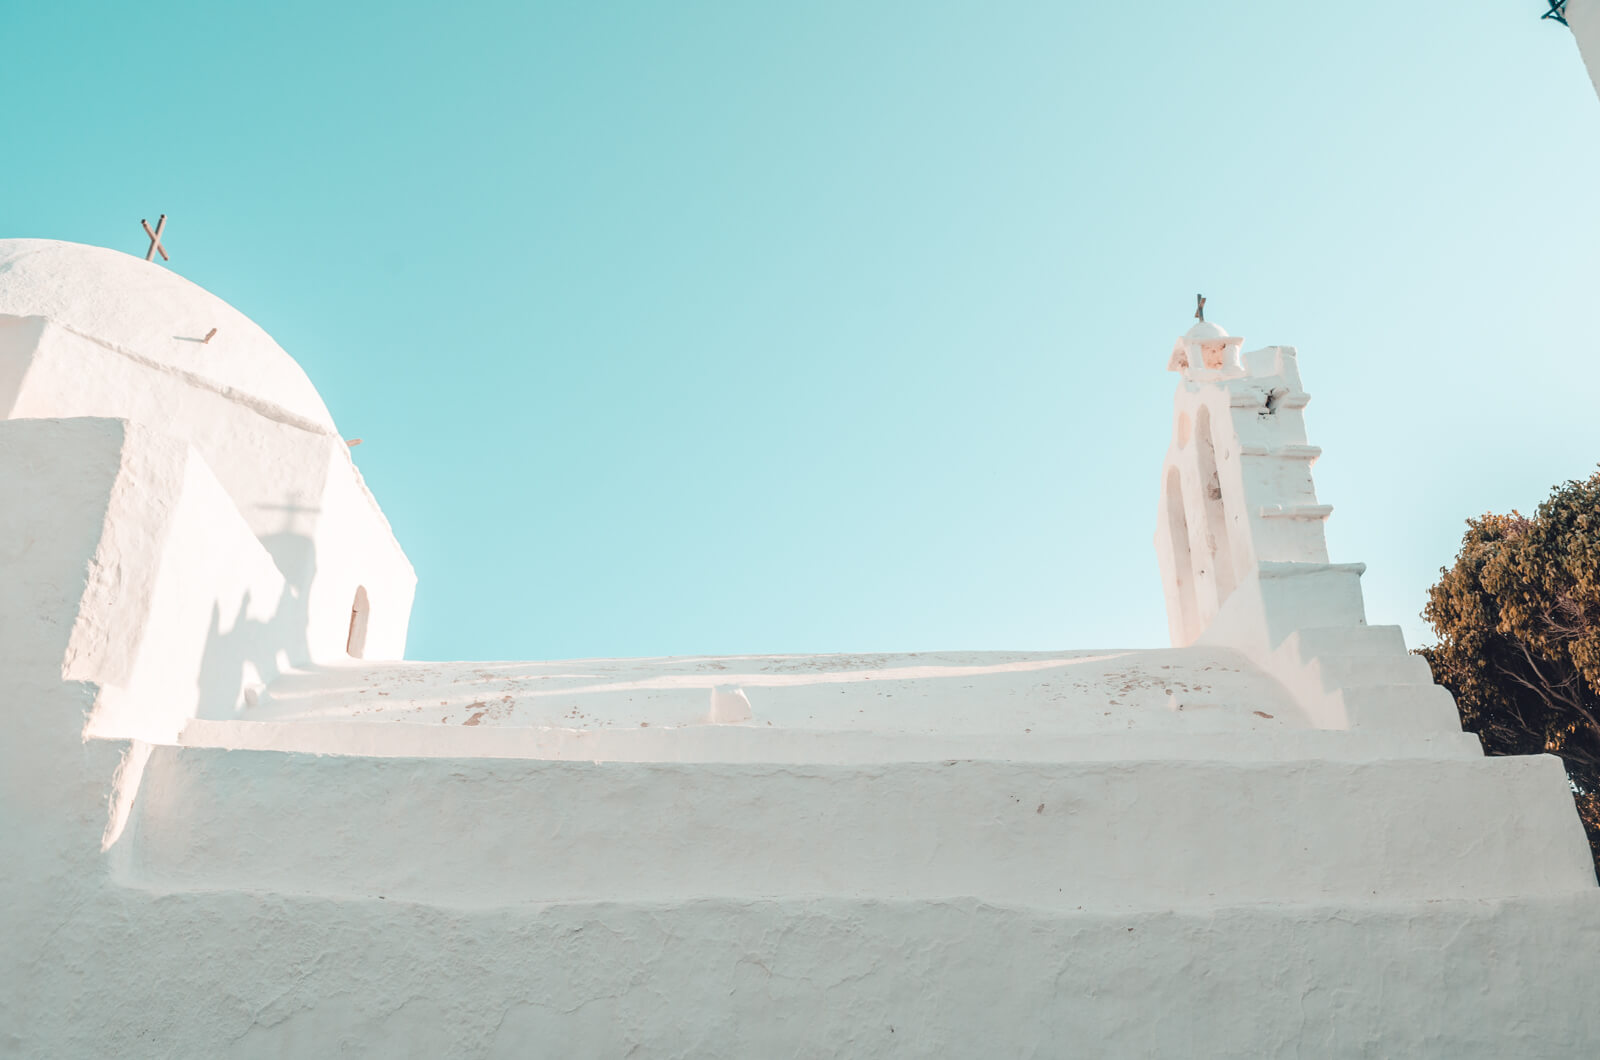 folegandros-cyclades-greece-la-vie-en-blog-all-rights-reserved-38